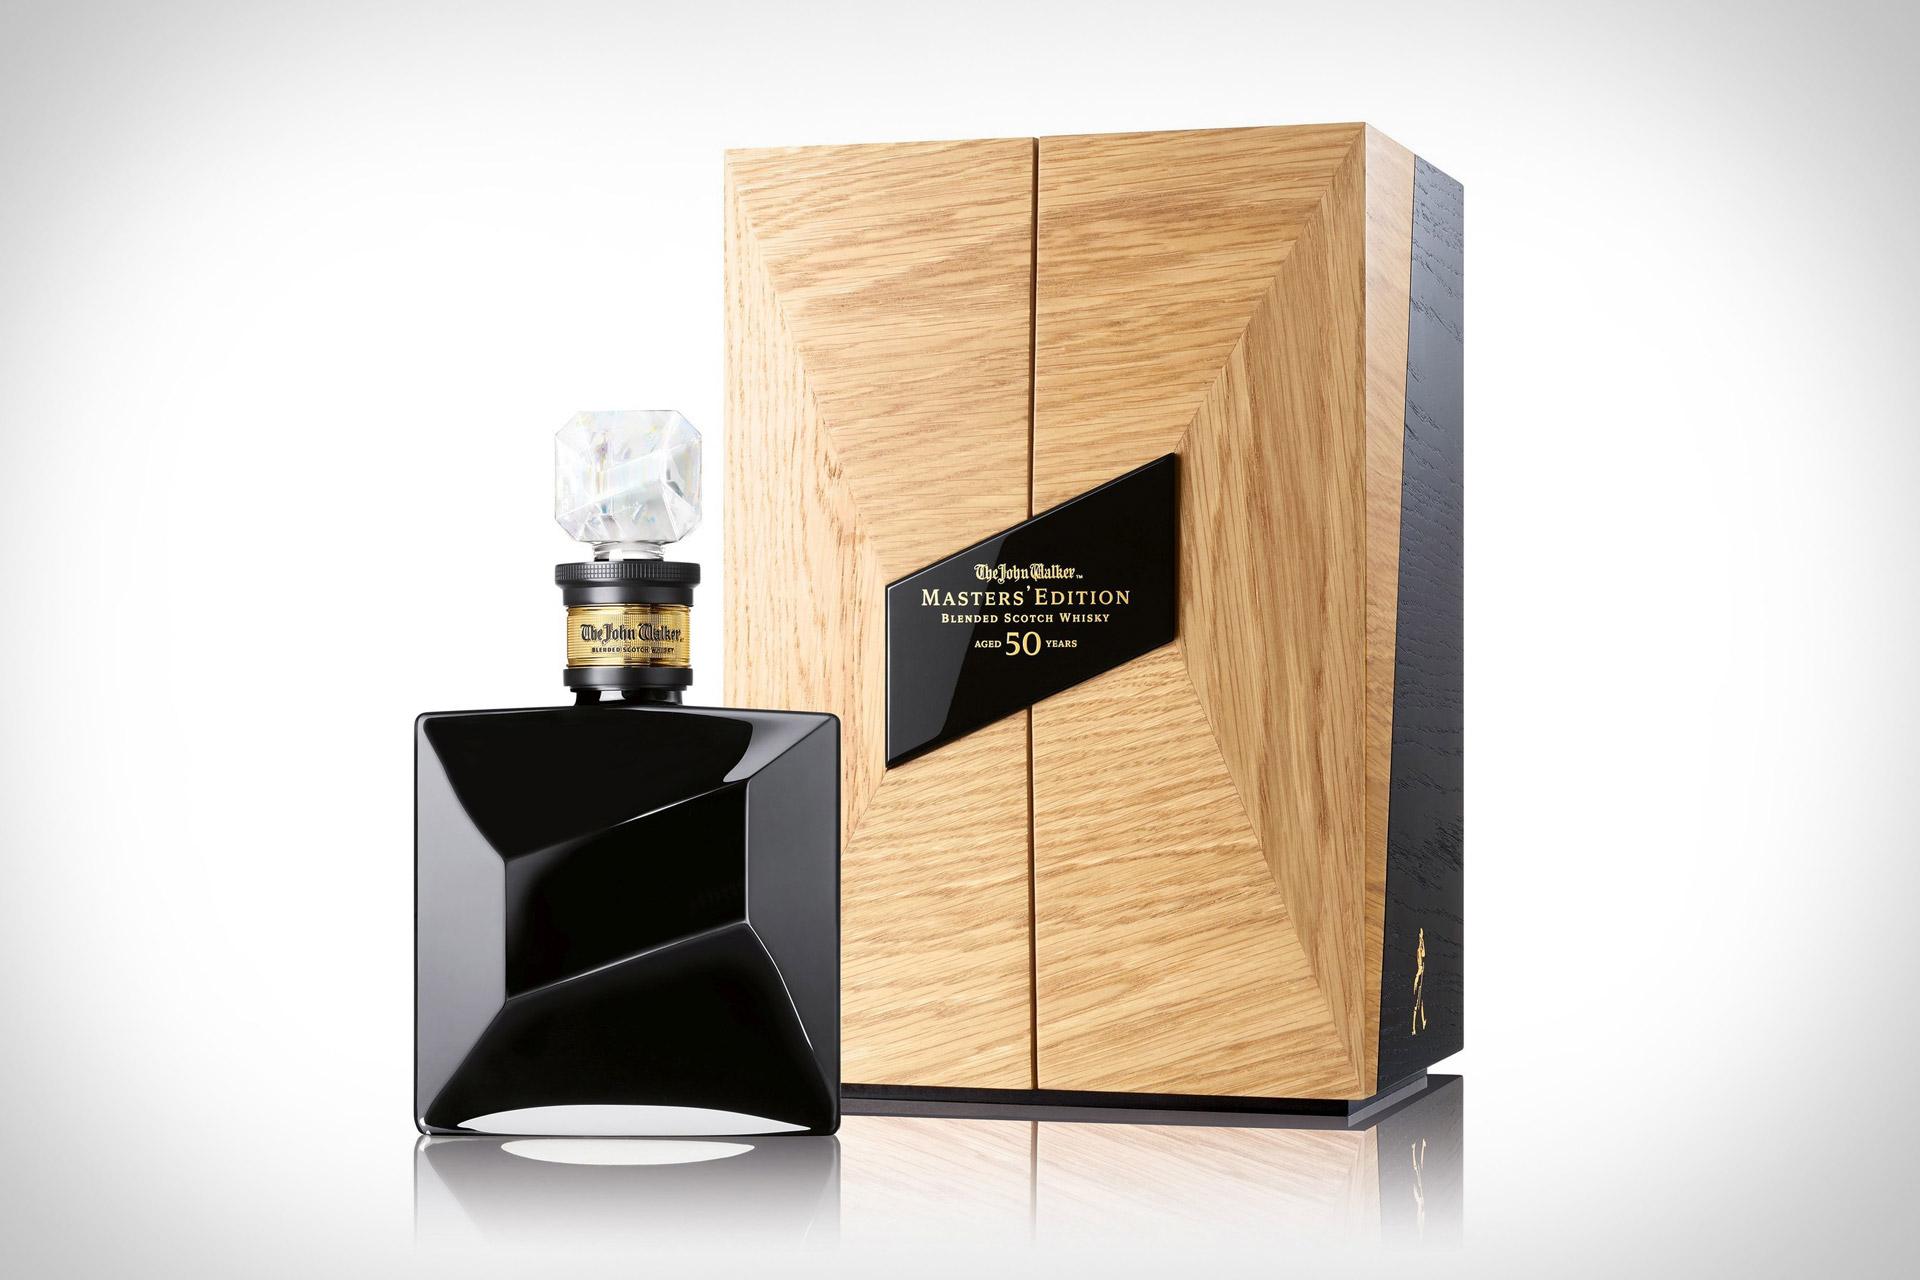 John Walker Master's Edition Whisky